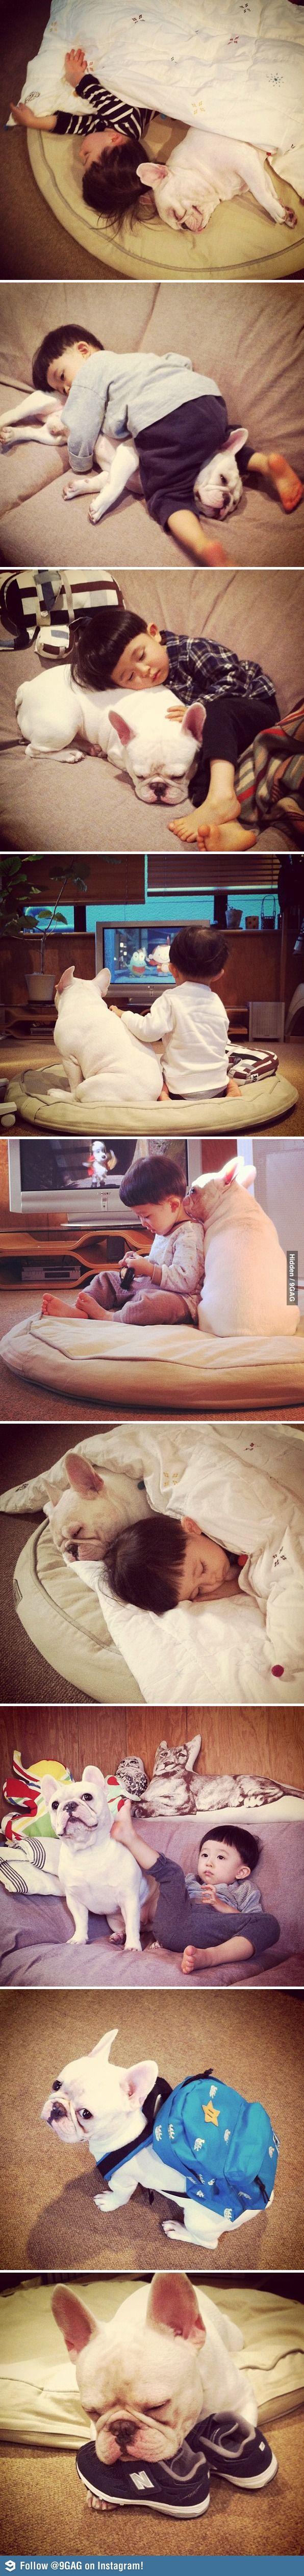 The sweetest friendship...cute!